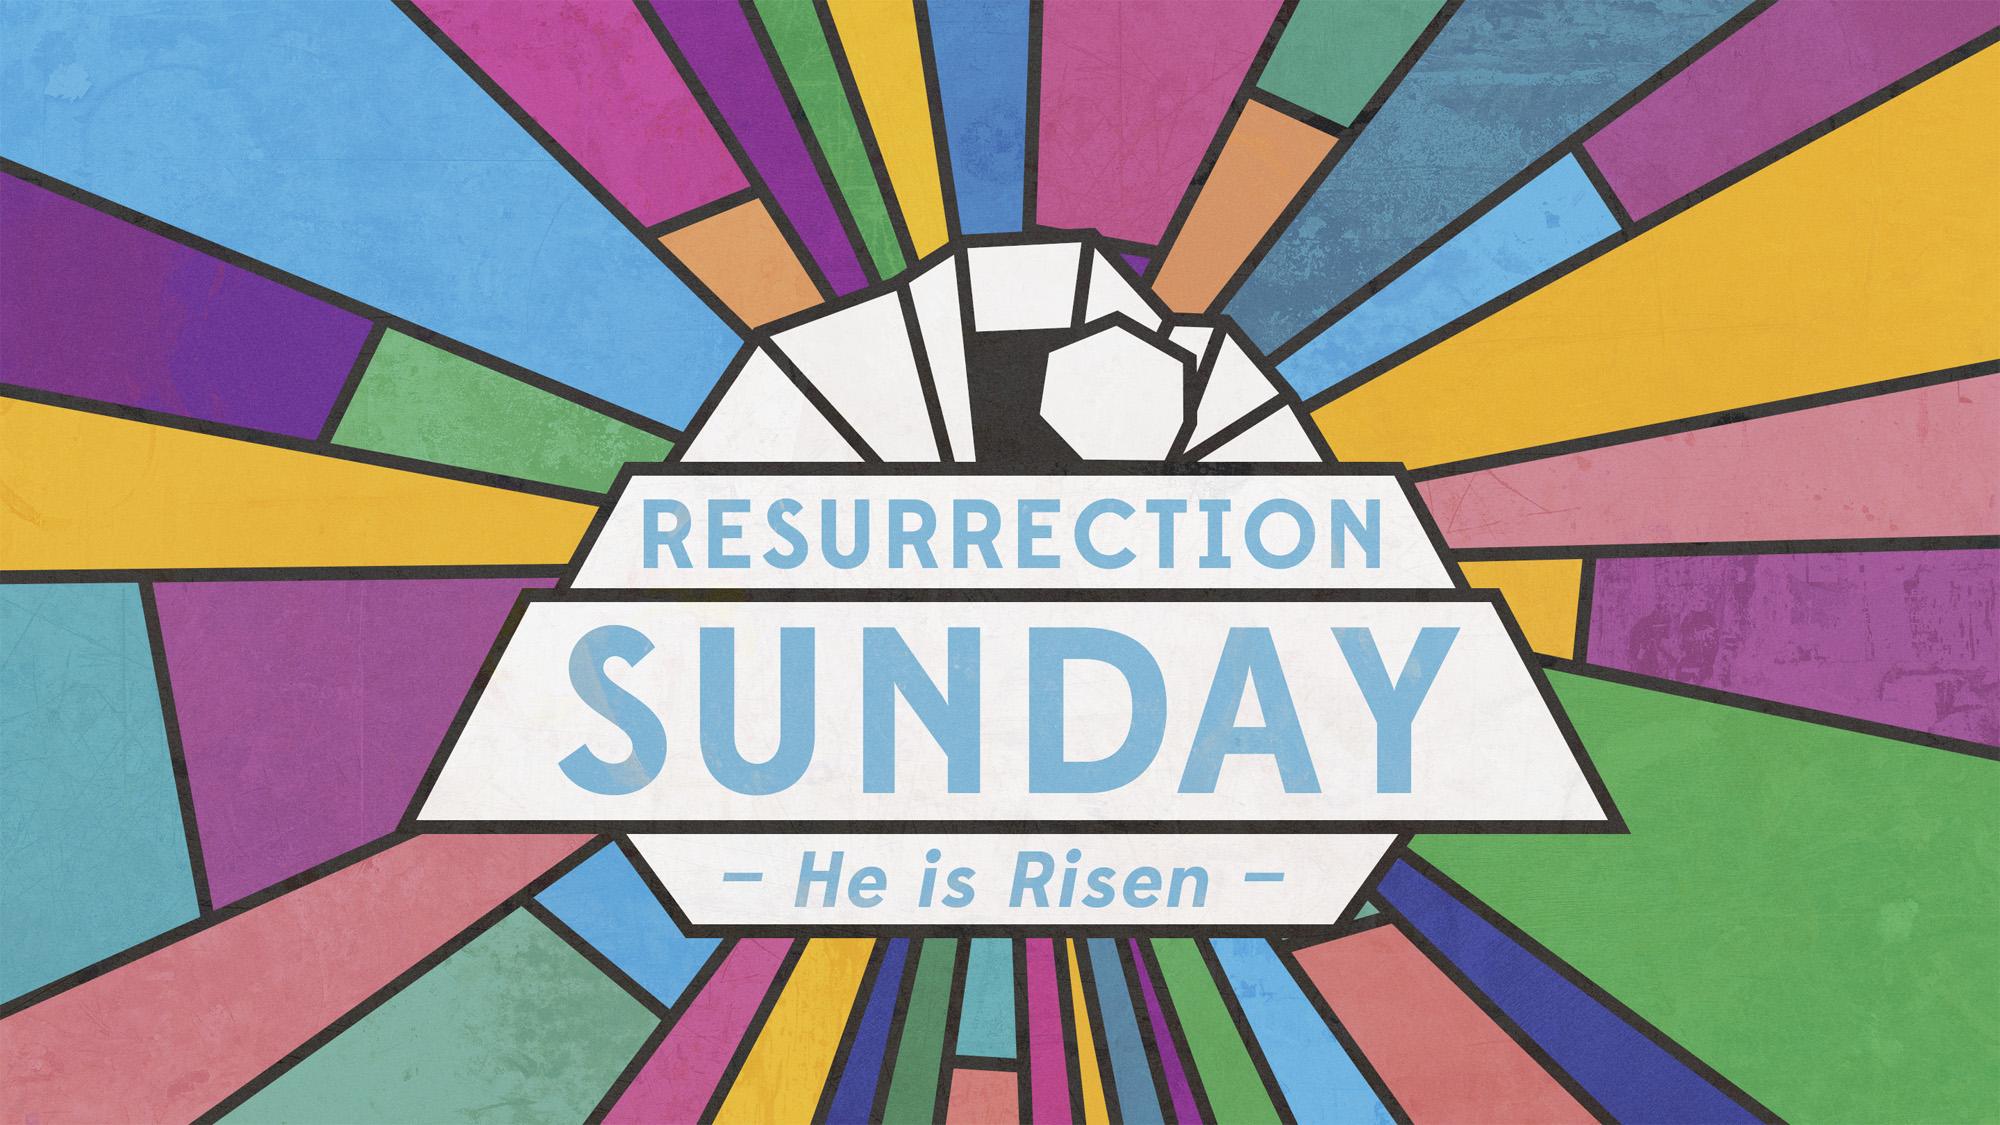 Resurrection Sunday! - Join us as we celebration the Resurrection of Jesus!April 21st - 9:00 & 11:00 am